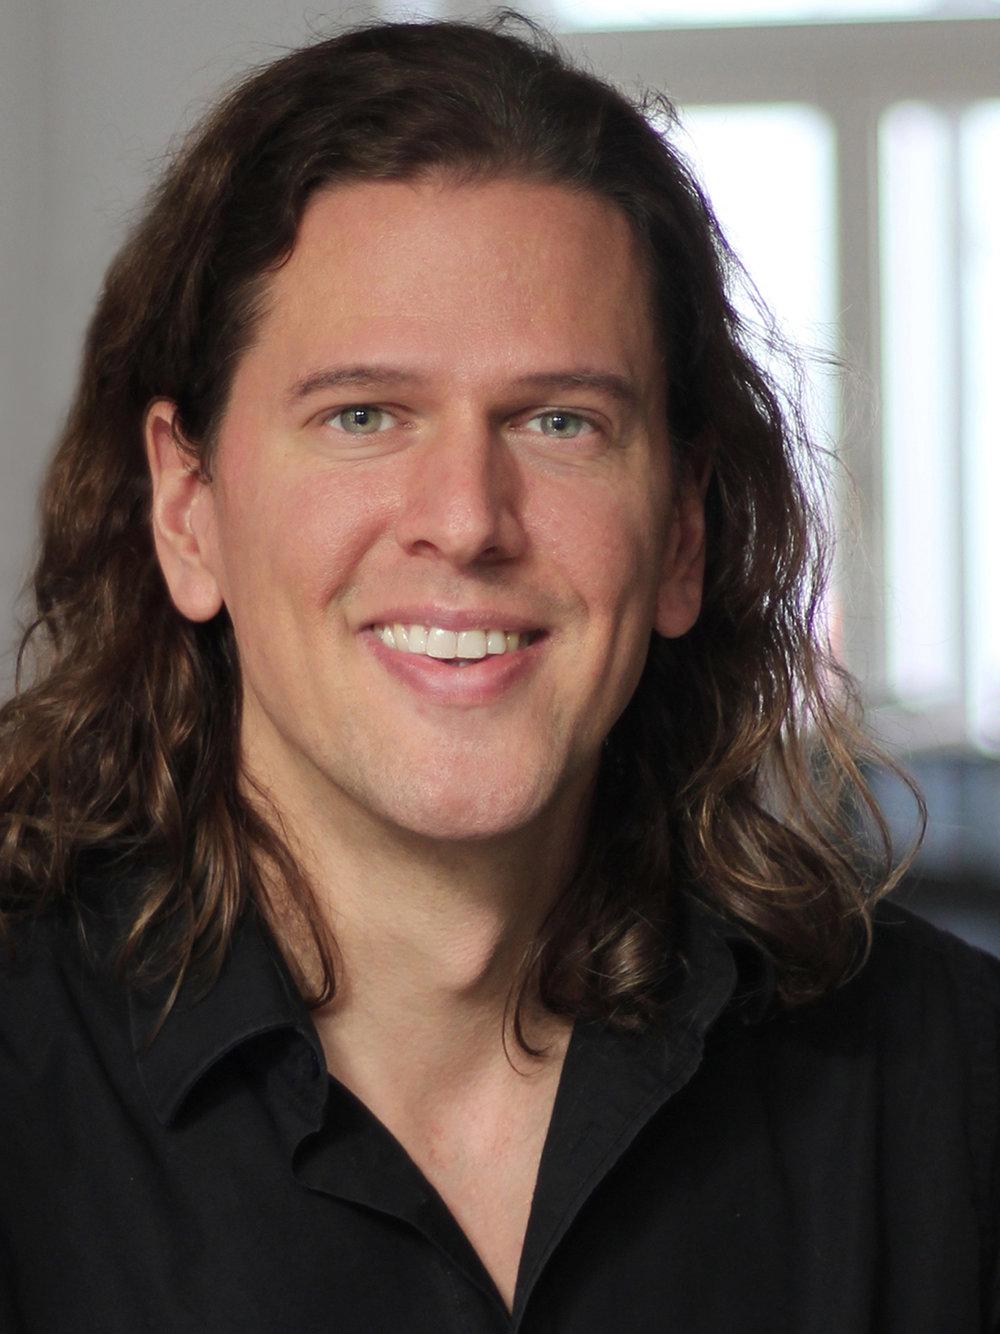 FrankScheele-Portrait2-4x3-web.jpg